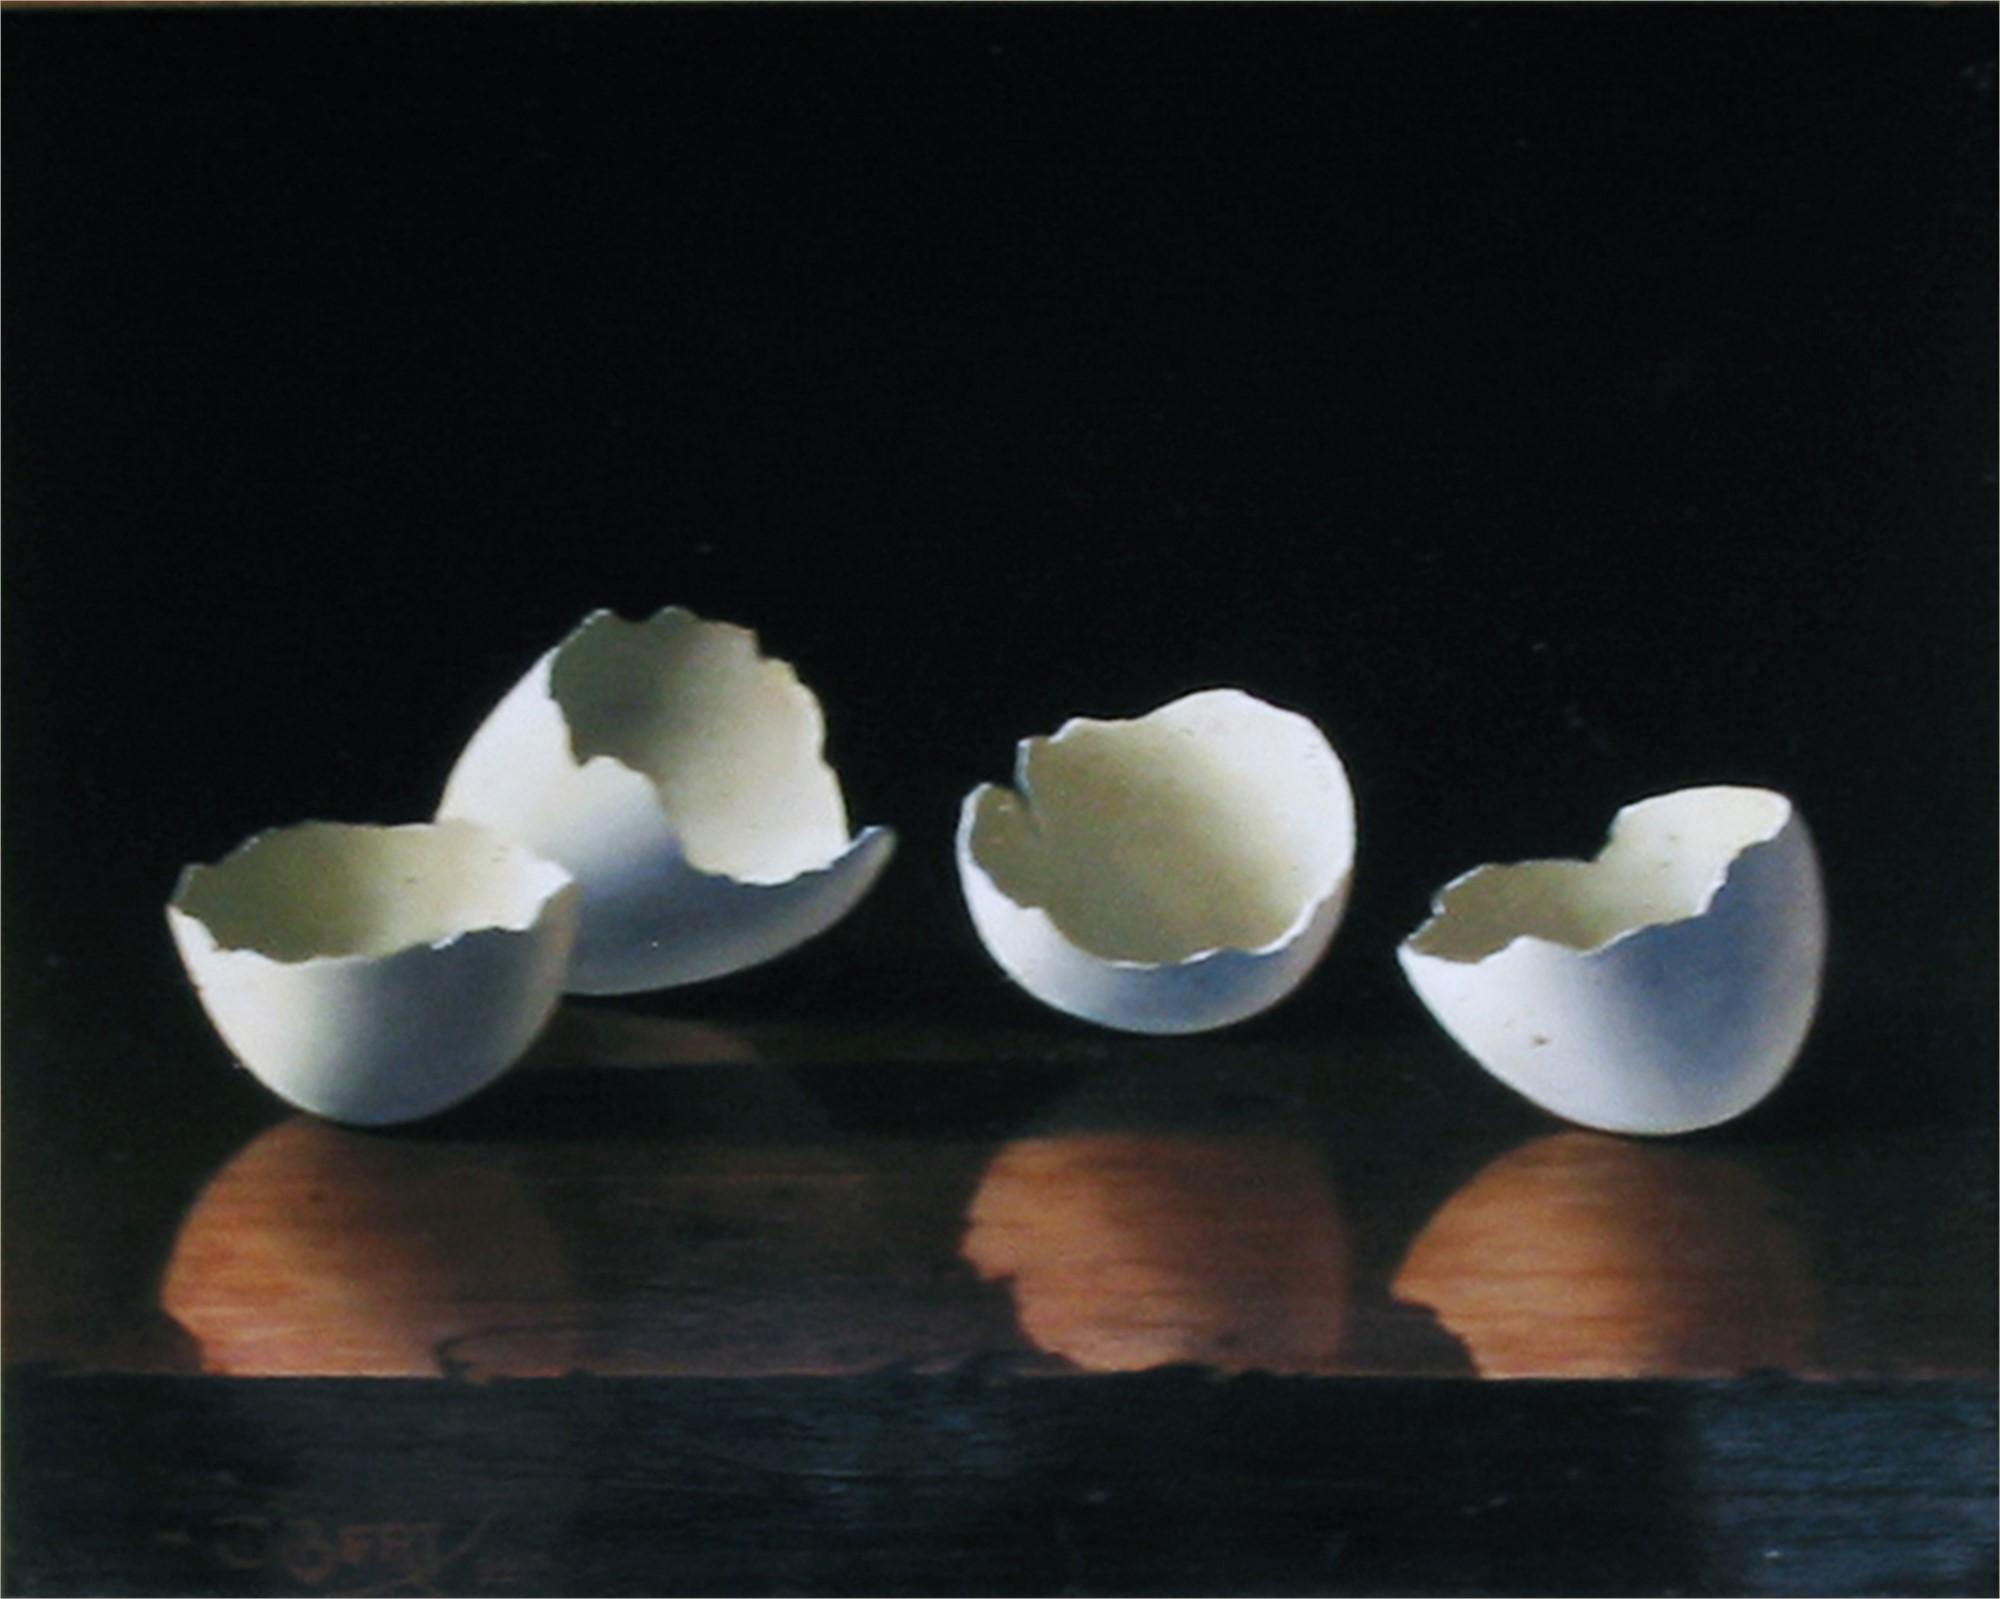 EGG SHELLS by DIBERT